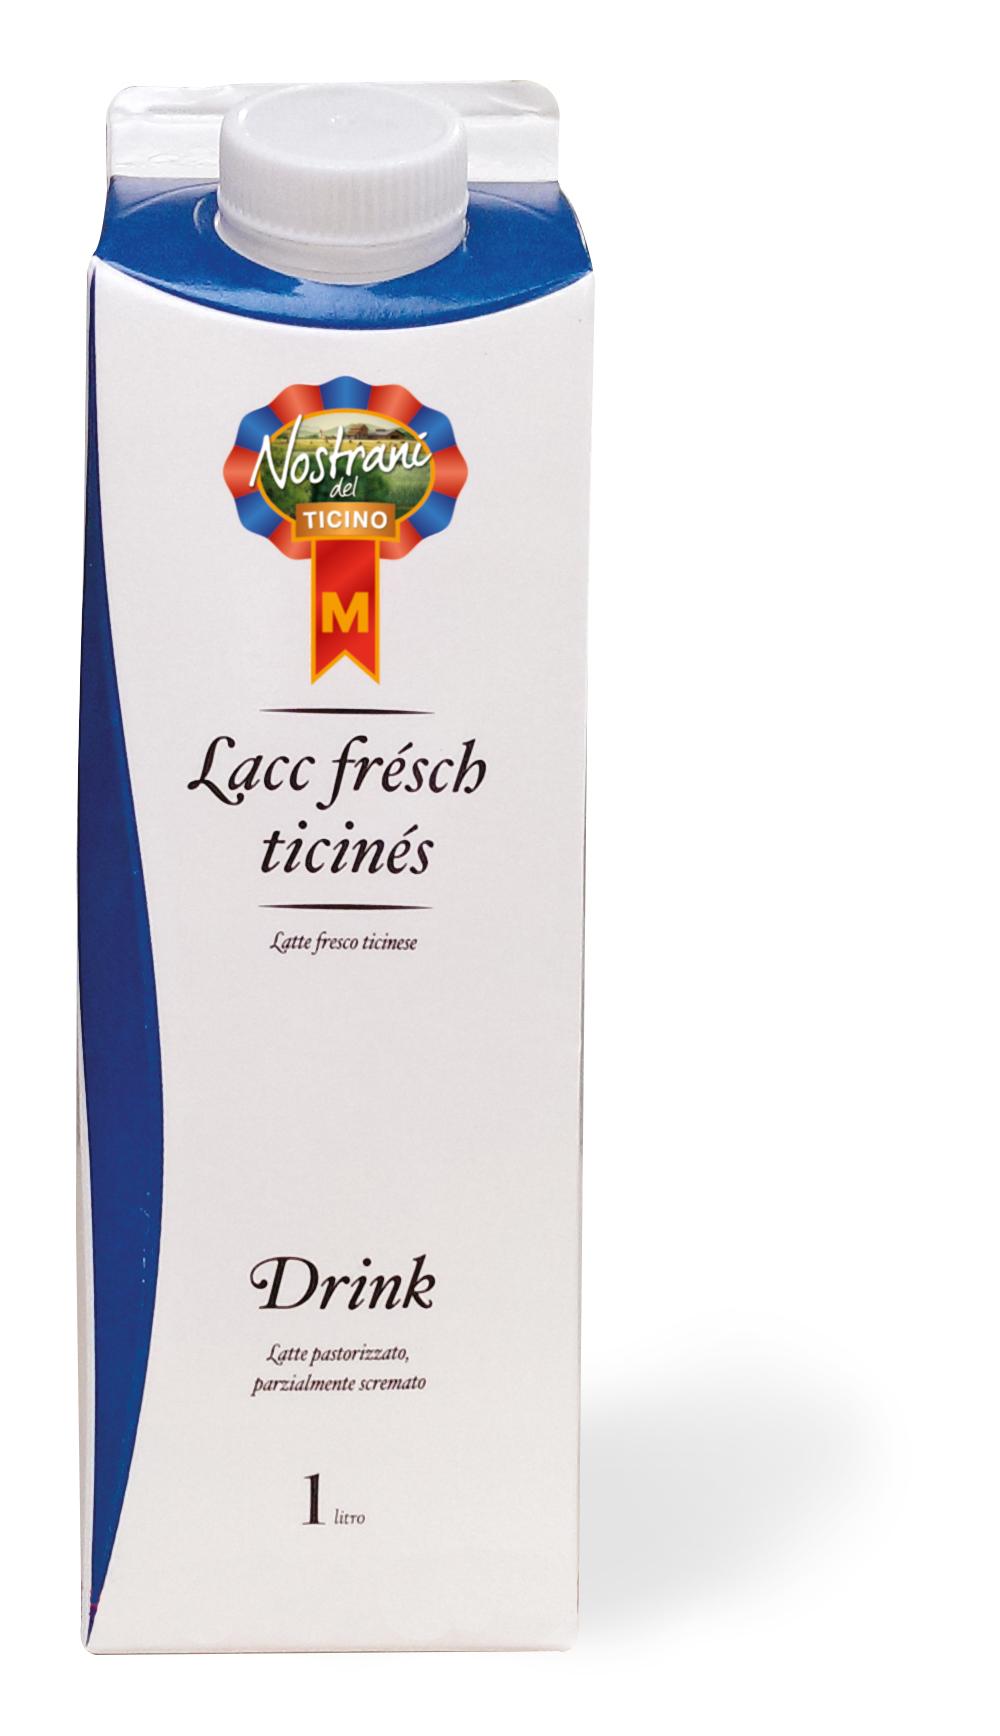 latte nostrano drink.jpg